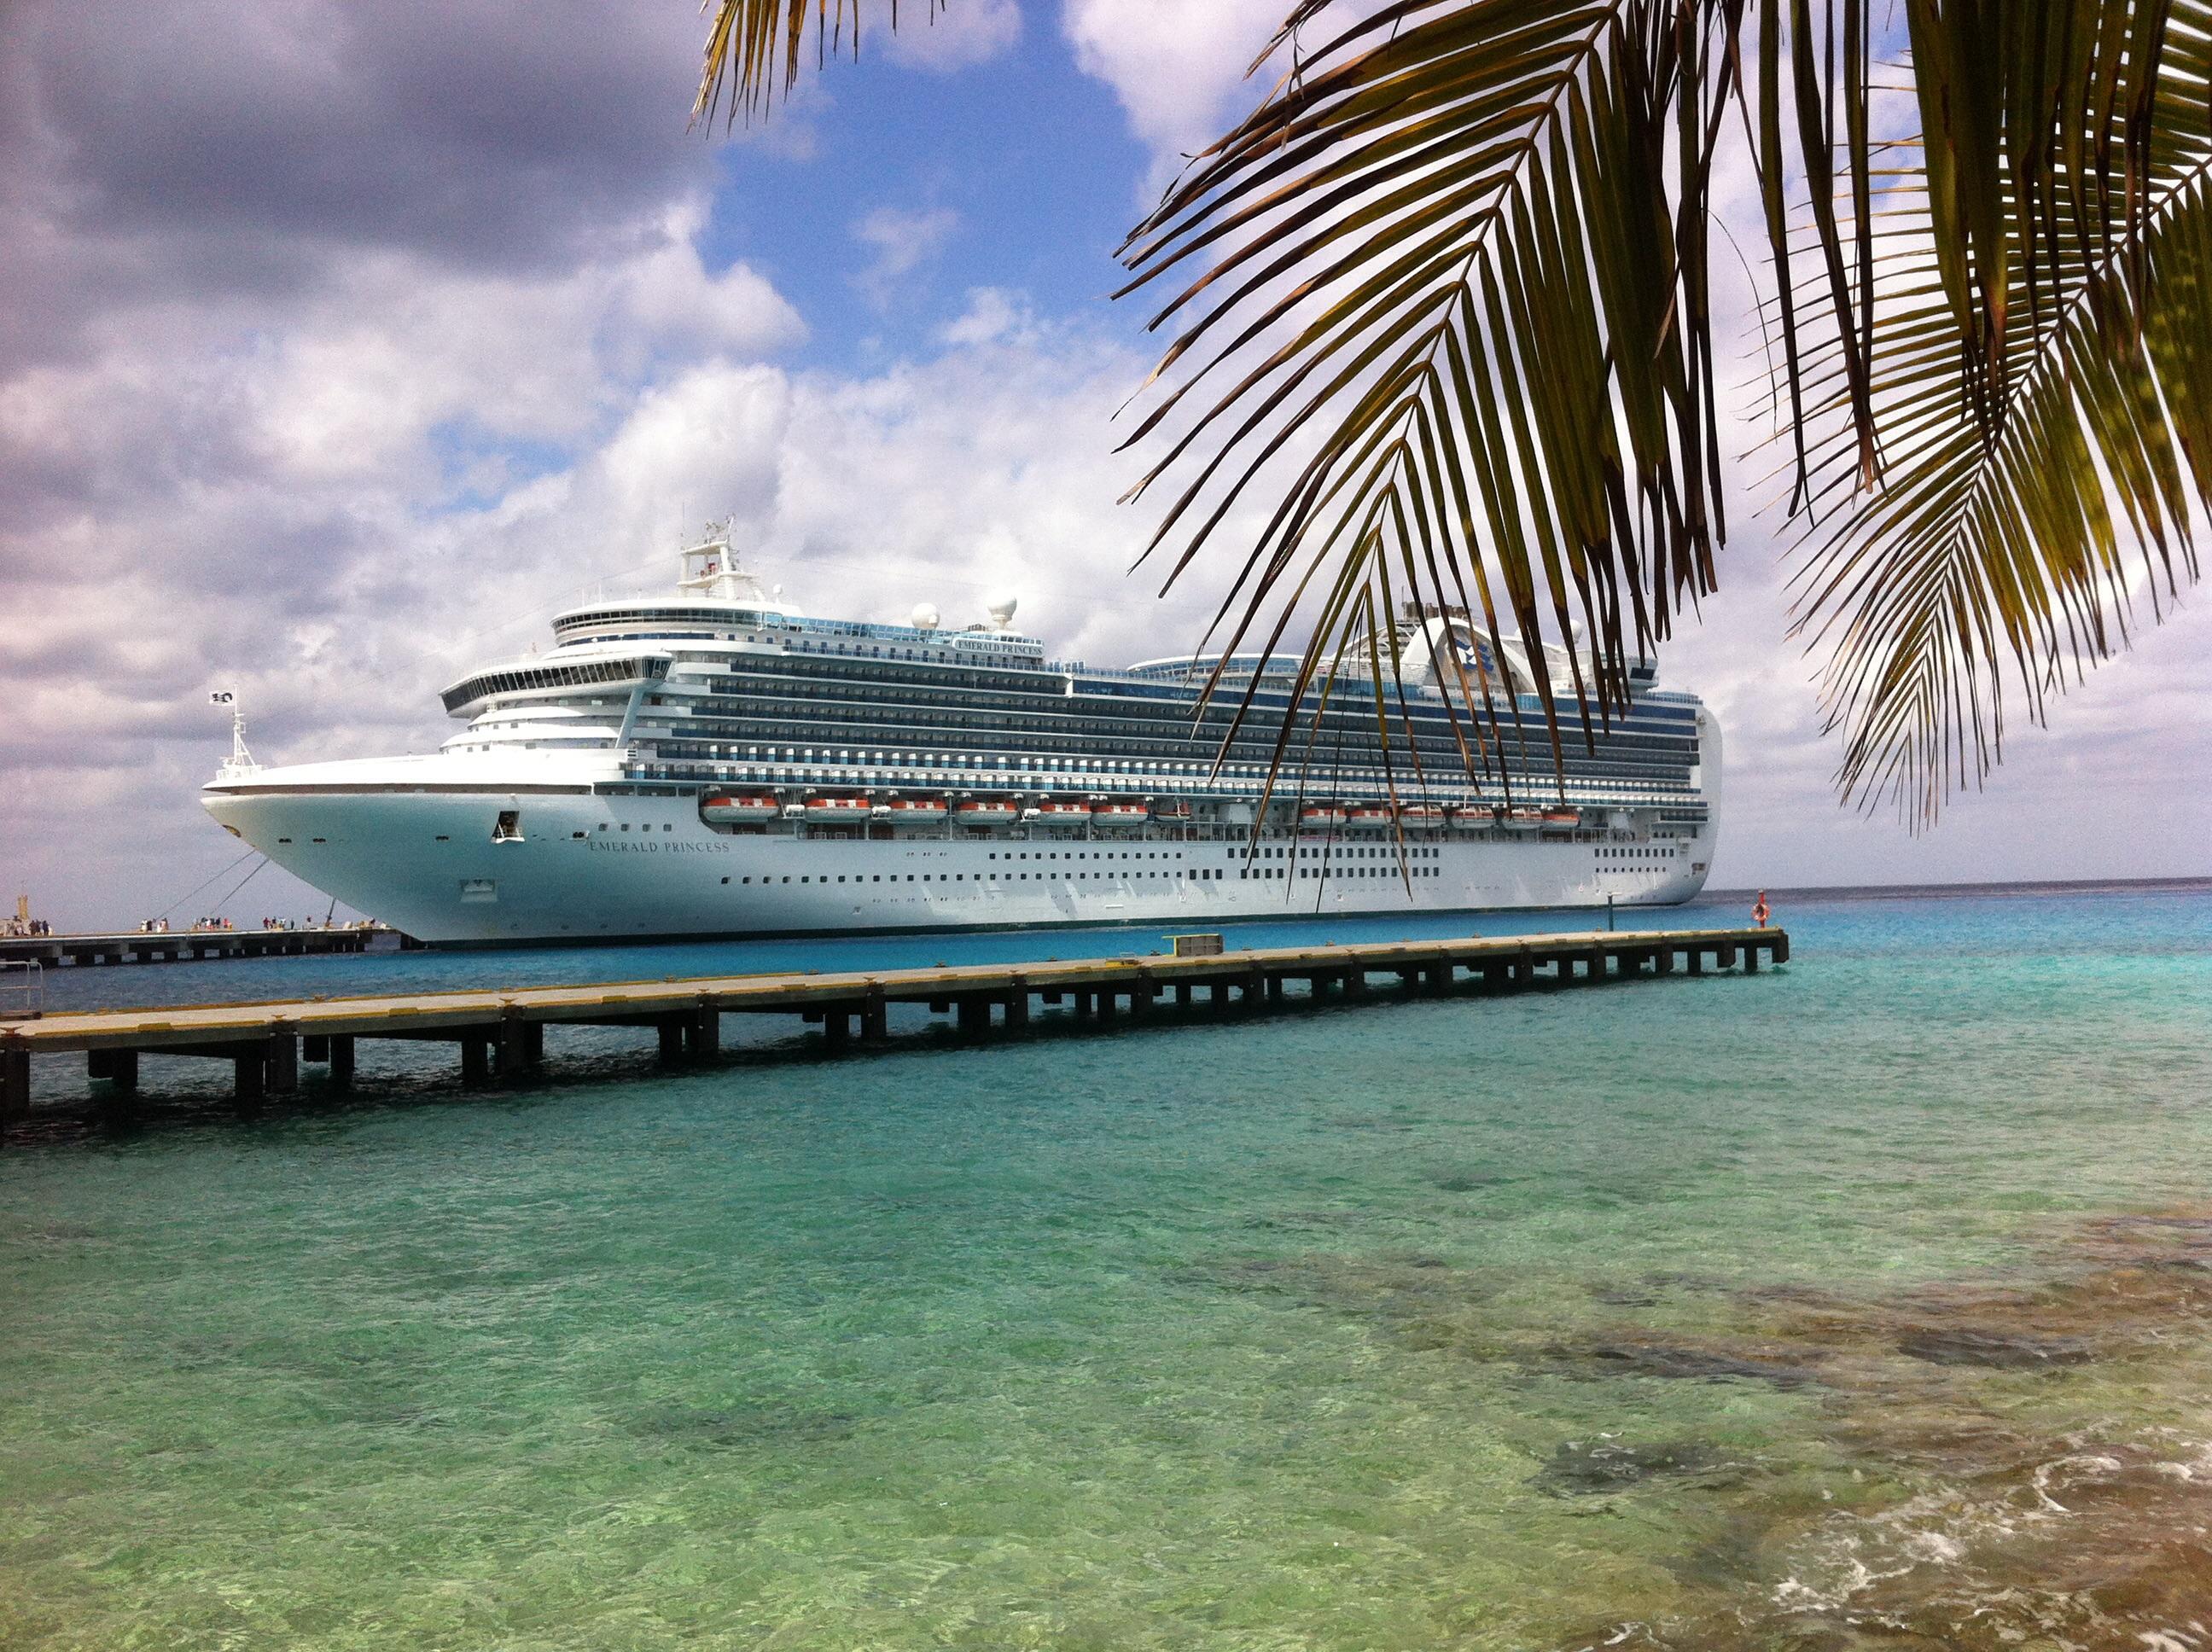 Emerald princess cruise ship reviews and photos cruiseline baanklon Gallery